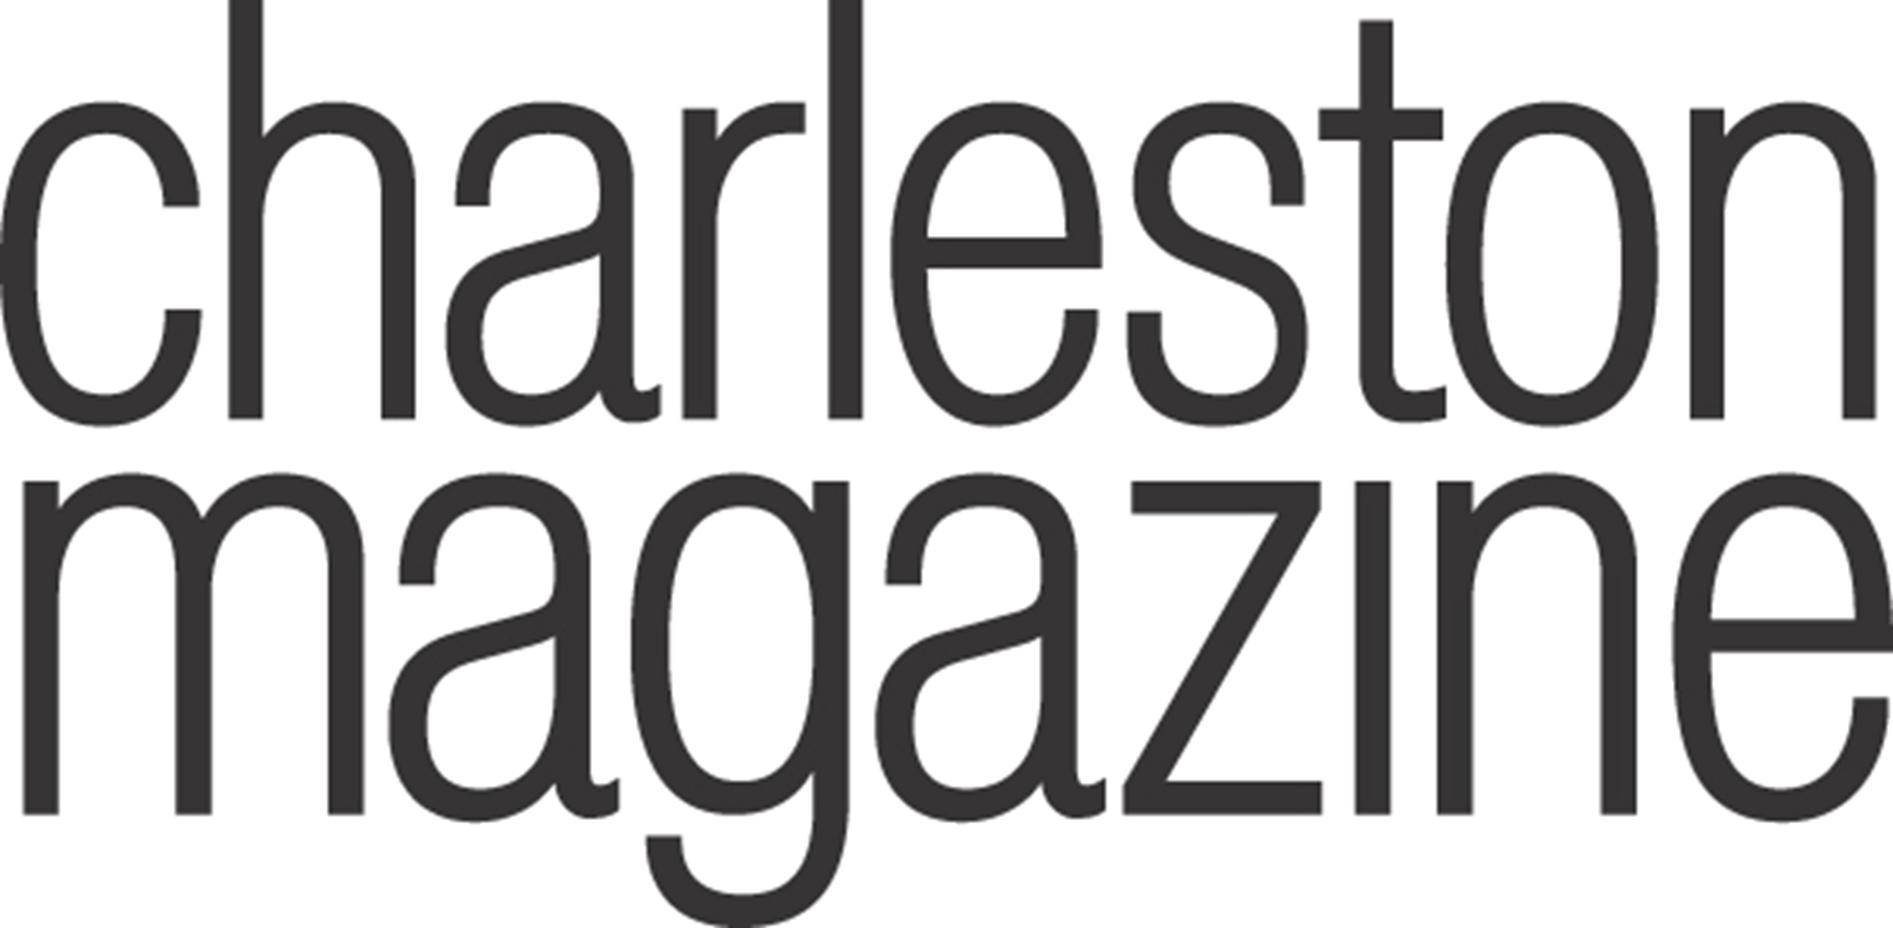 CharlestonMagazine.jpg